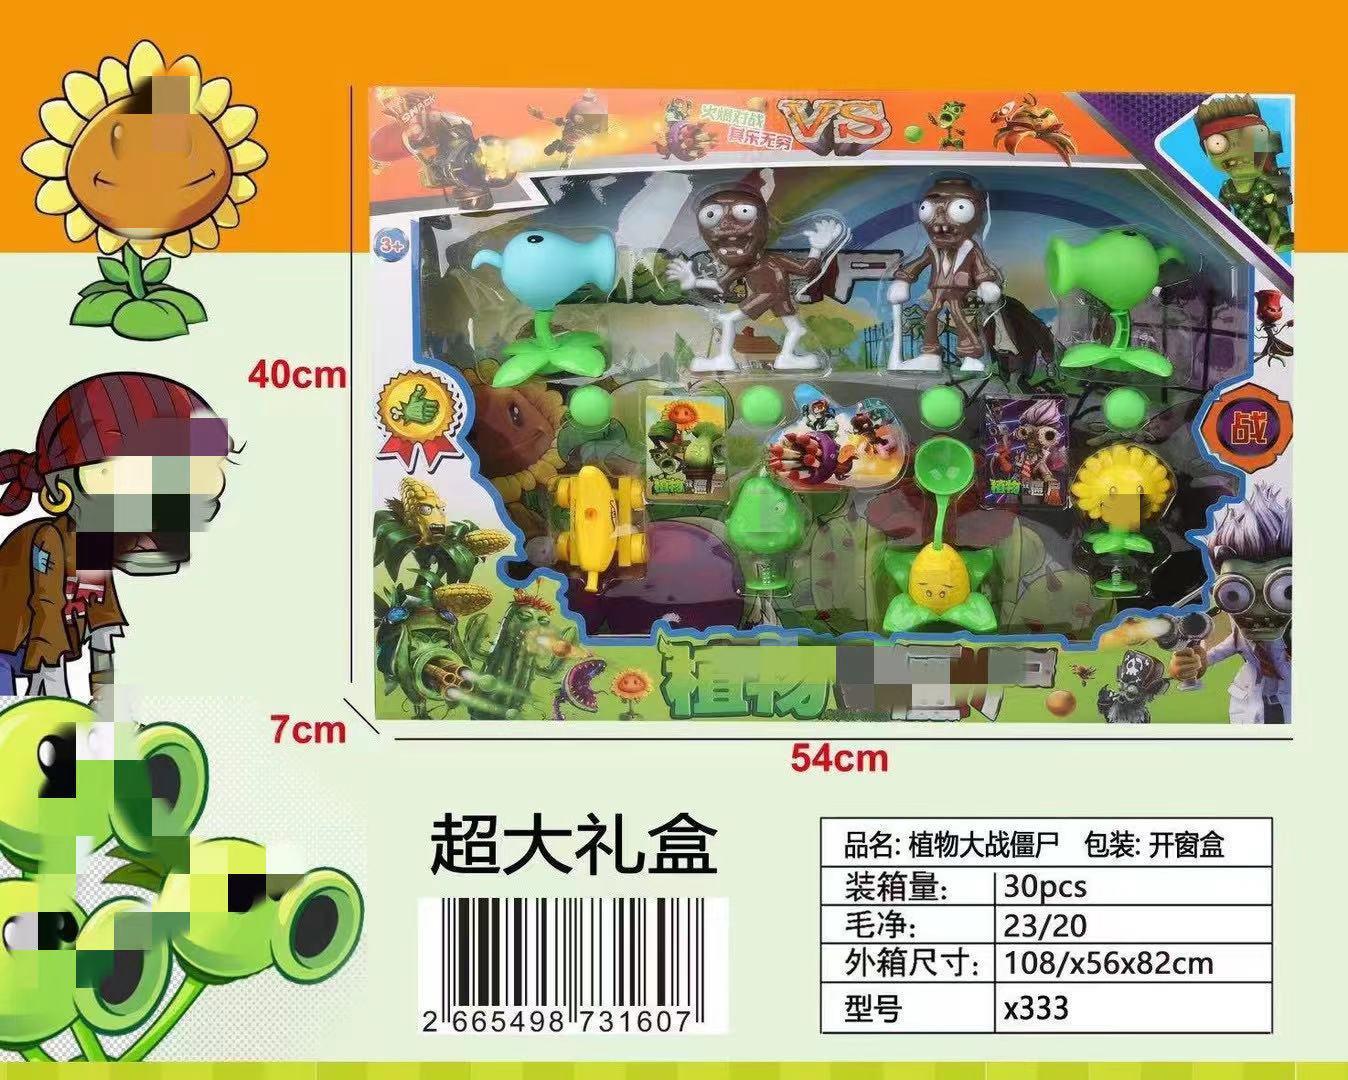 Genuine versatile plant battle can fire bullets pea big mouth flower soft rubber doll zombie toy set